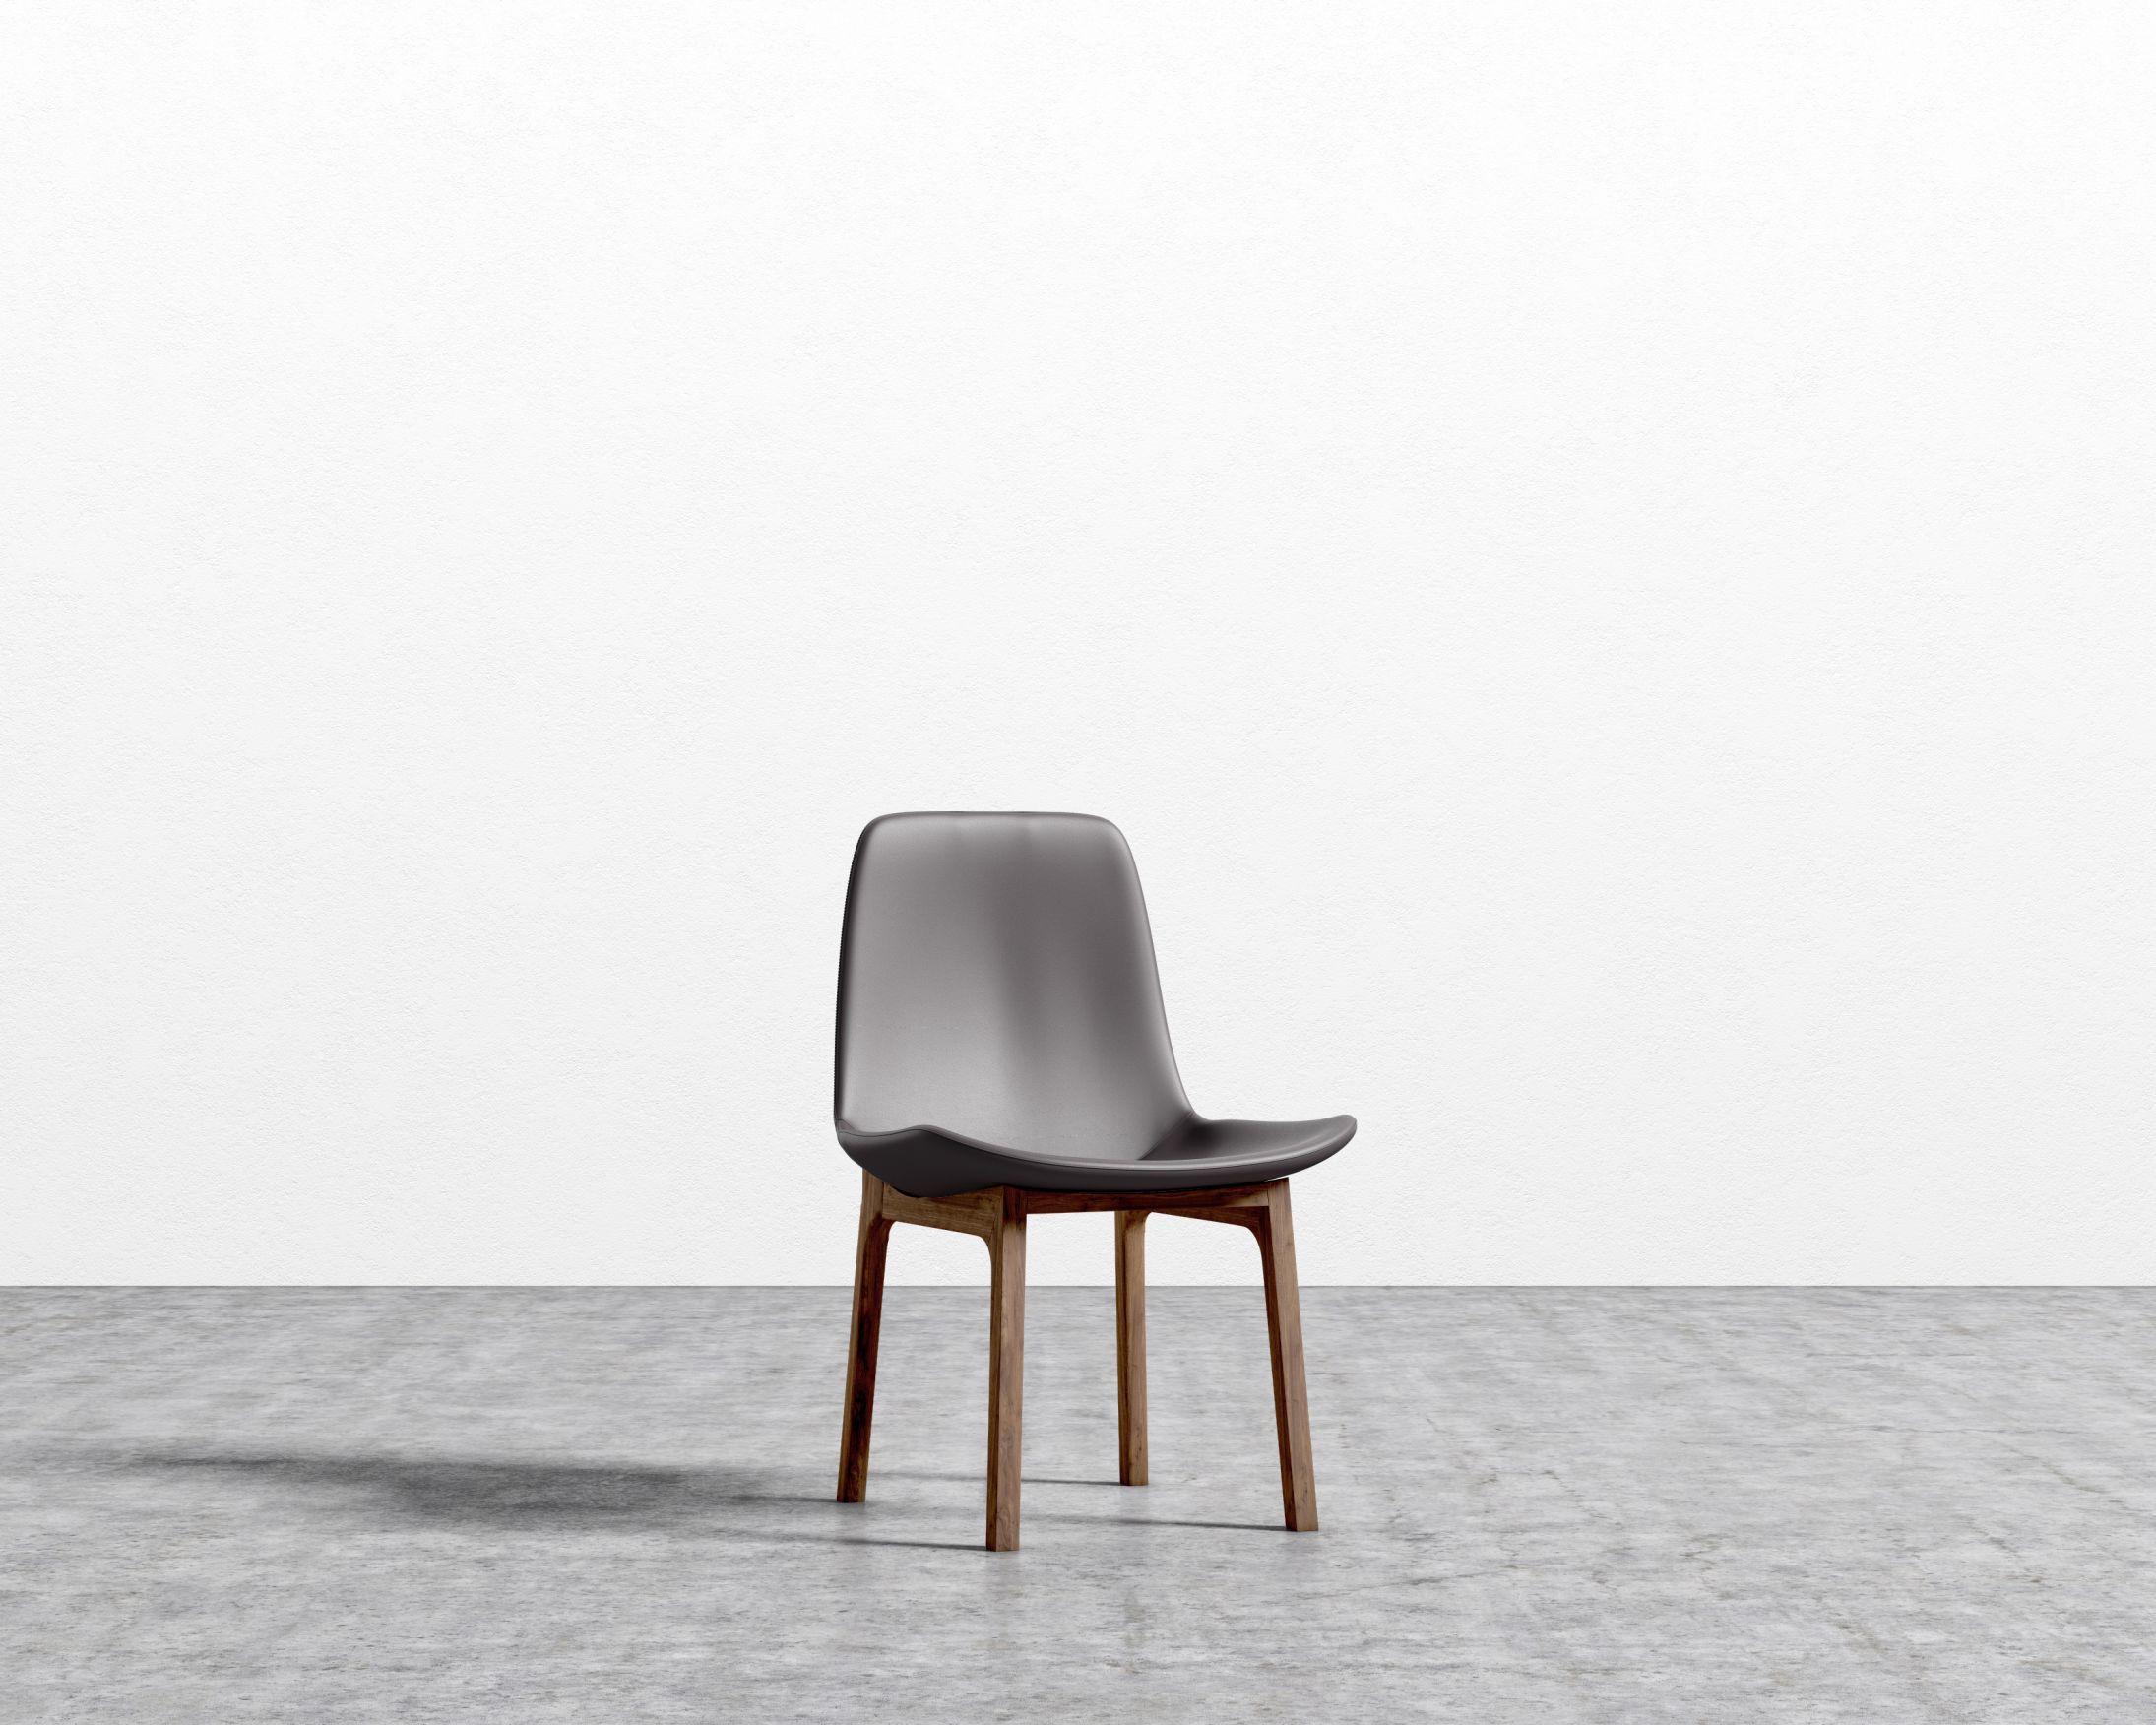 Sensational Aubrey Side Chair Rove Concepts Rove Concepts Mid Century Creativecarmelina Interior Chair Design Creativecarmelinacom